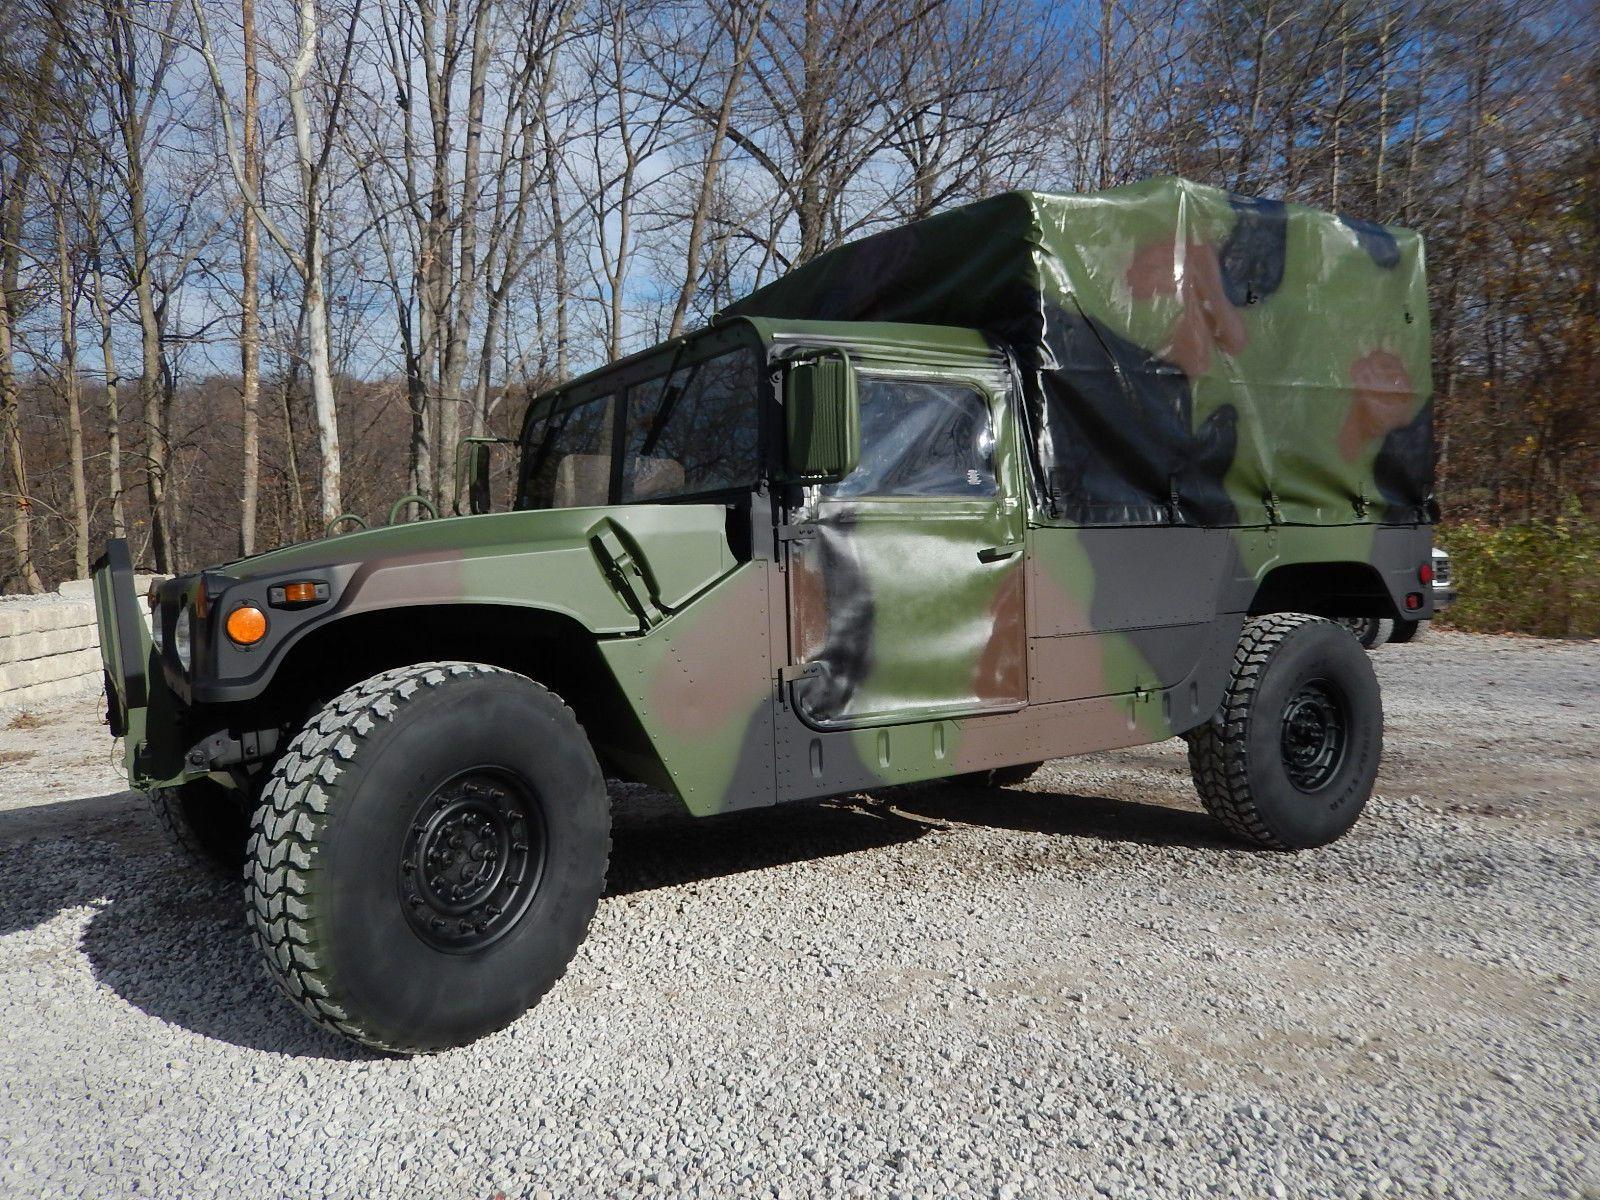 1994 M998 Humvee 2 man soft top AM General for sale